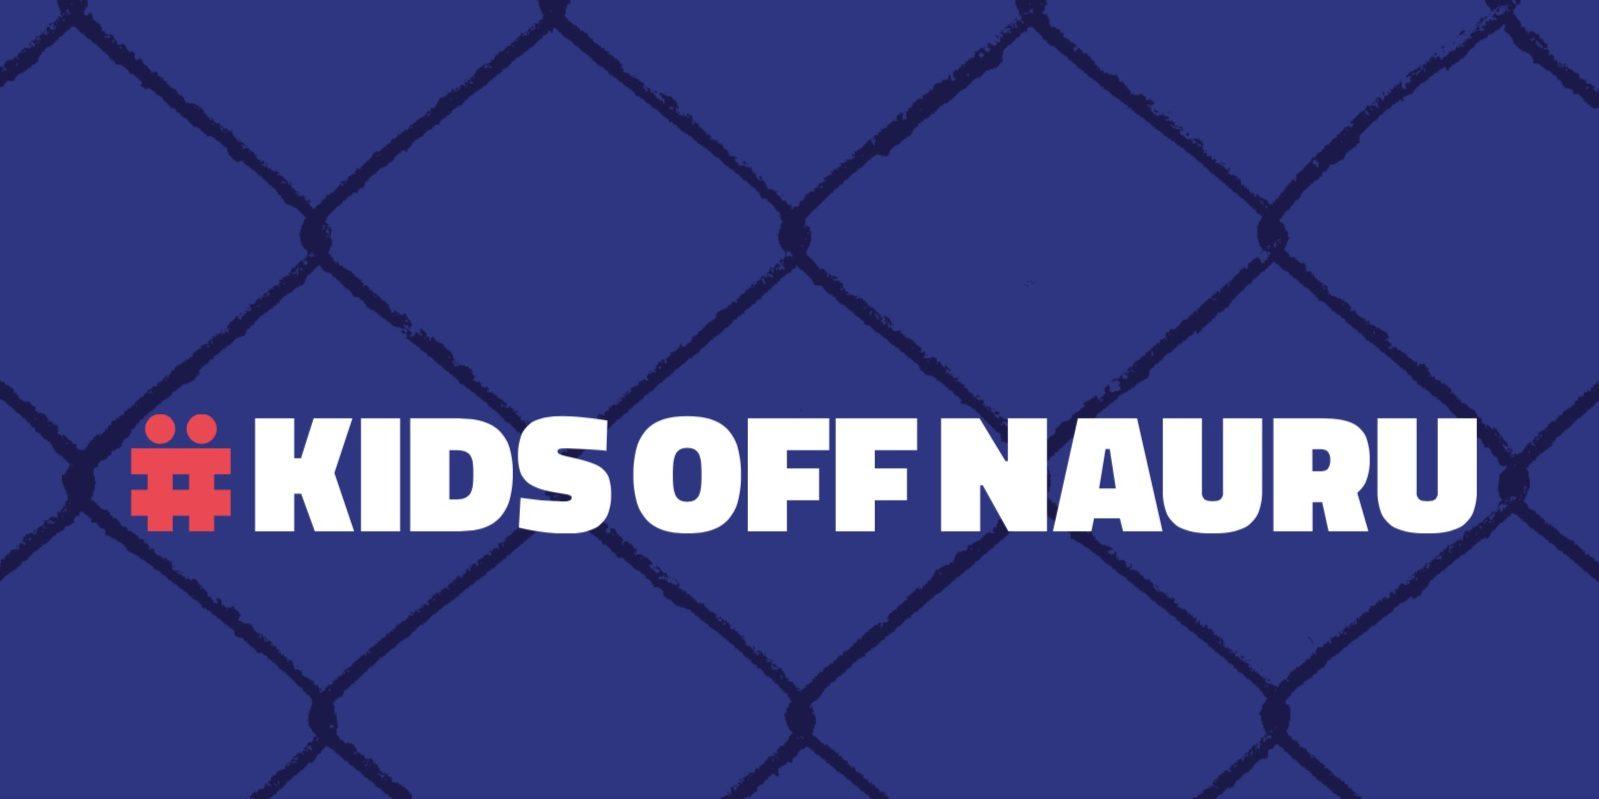 Kids Off Nauru. Why Isn't This A No-Brainer?